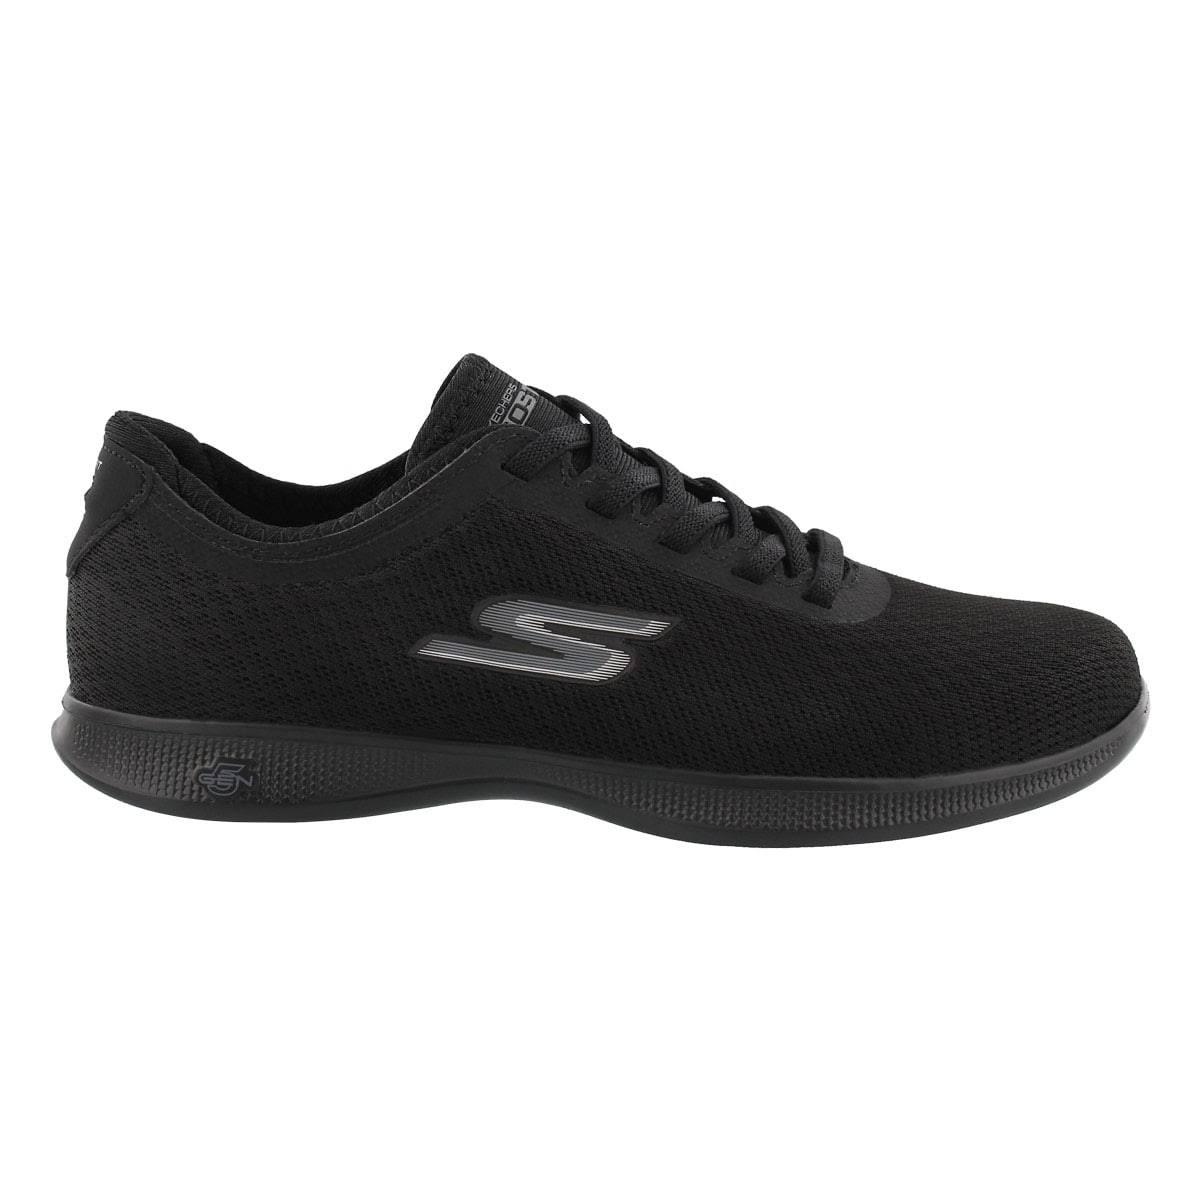 Schoenen Navypink Skechers Step LiteAgile Black Mesh Women's Go wkiuPOTXZ